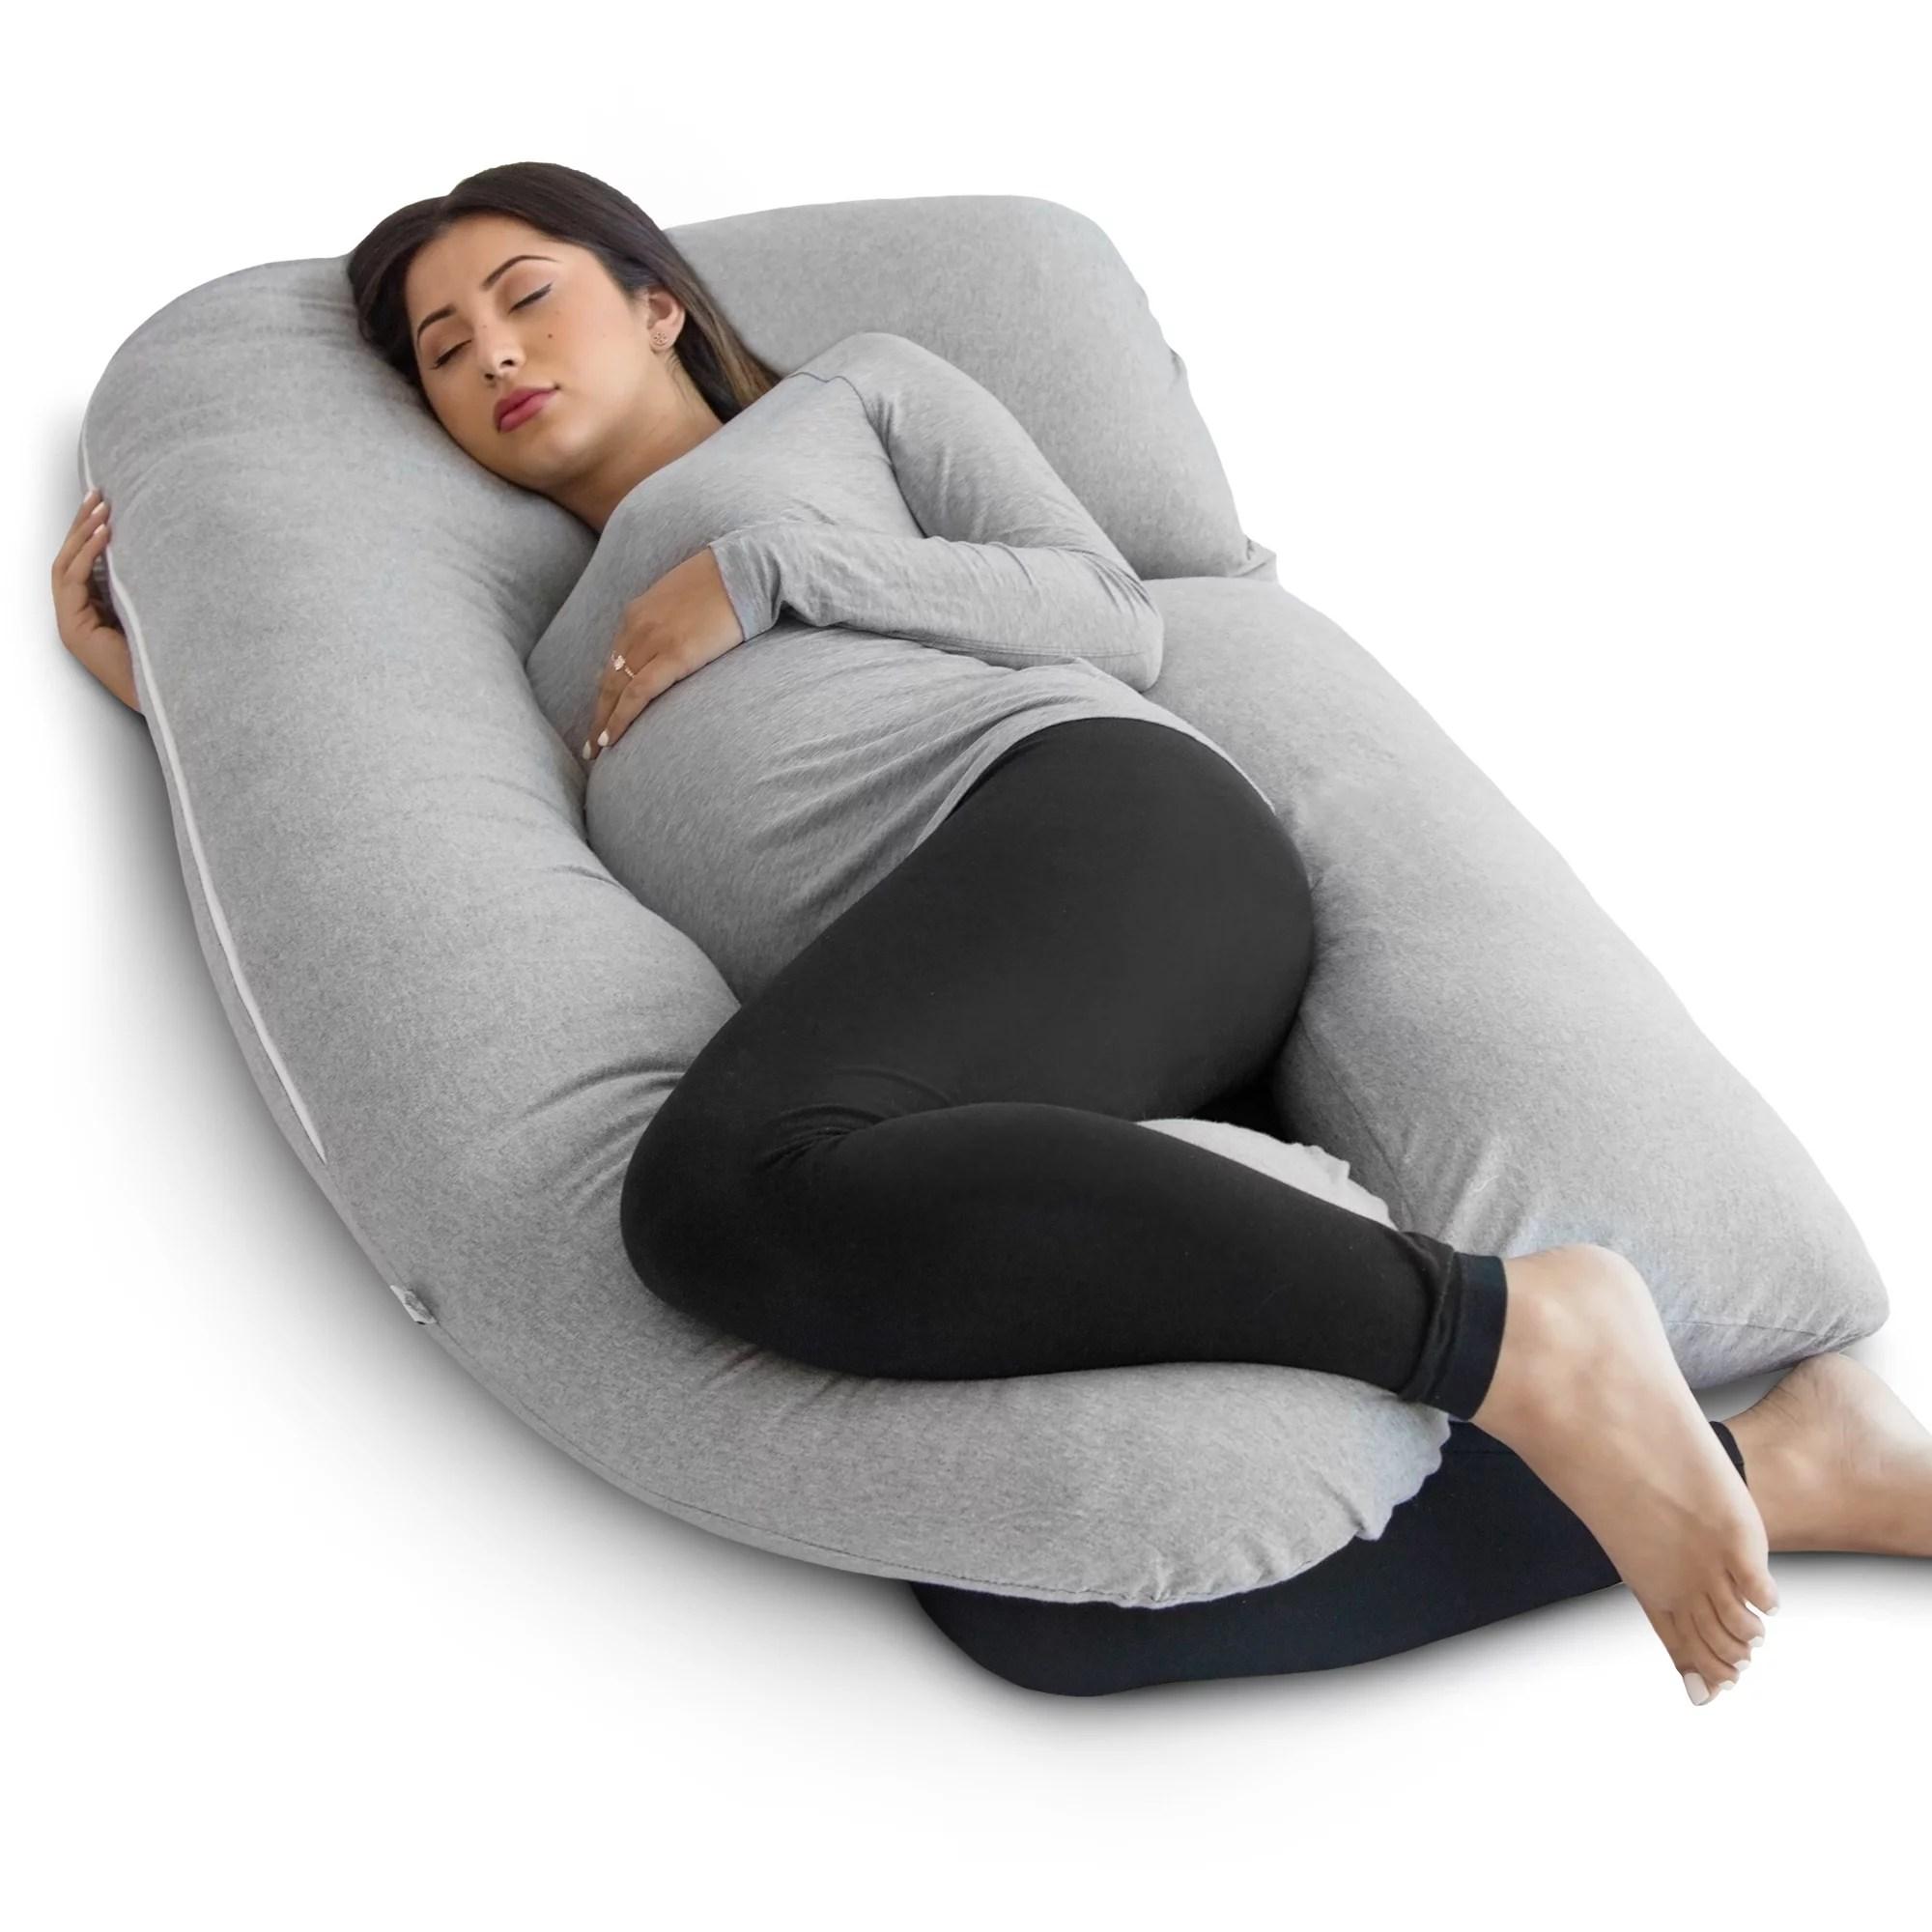 PharMeDoc Full Body Pregnancy Pillow U Shaped Body